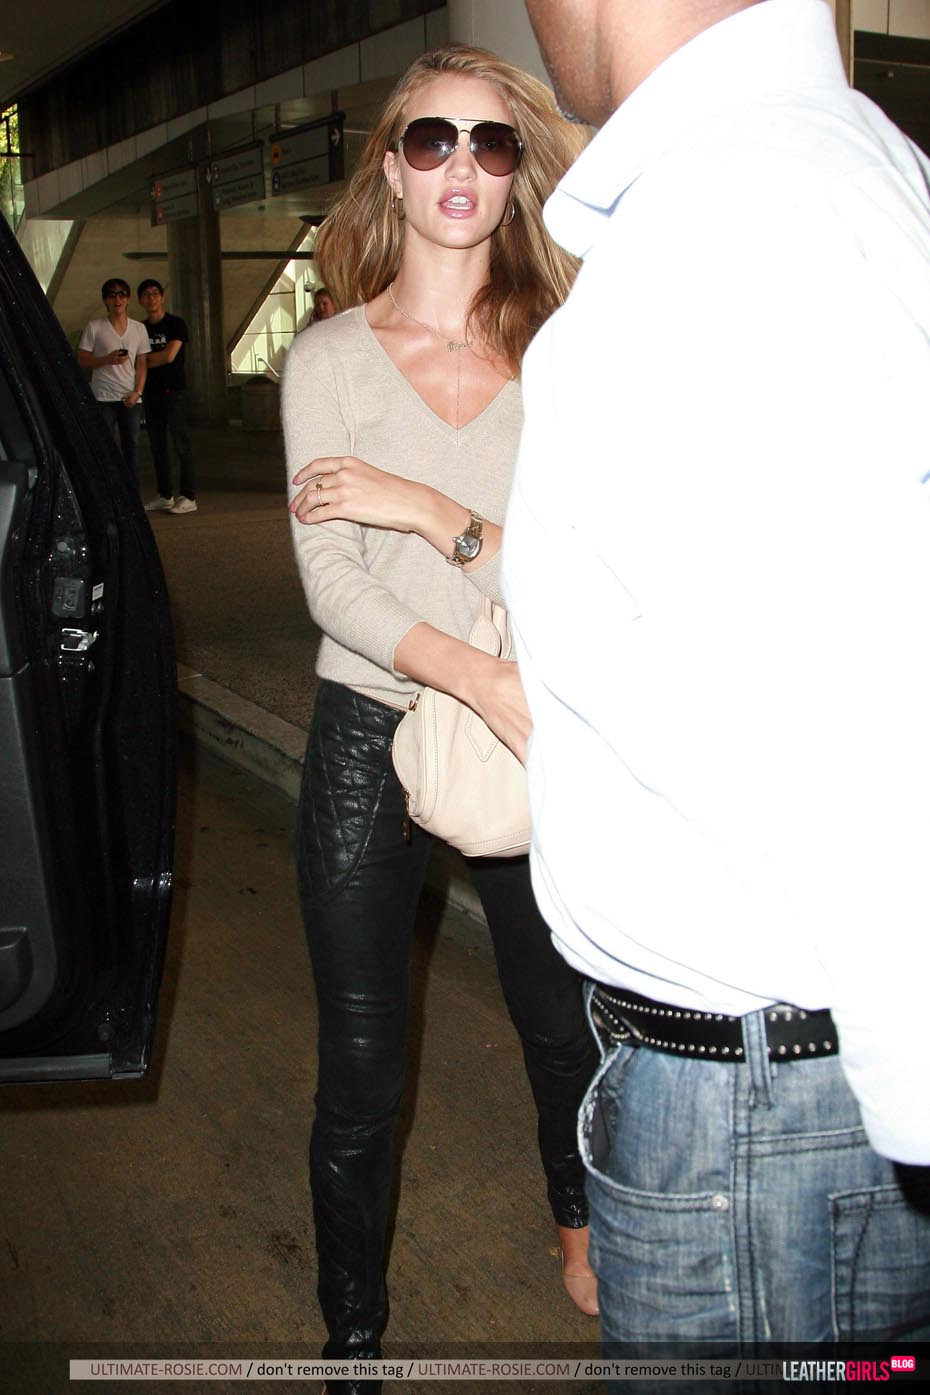 Rosie Huntington-Whiteley was spotted arriving back in LA leathergirlsblog-com- (13).jpg